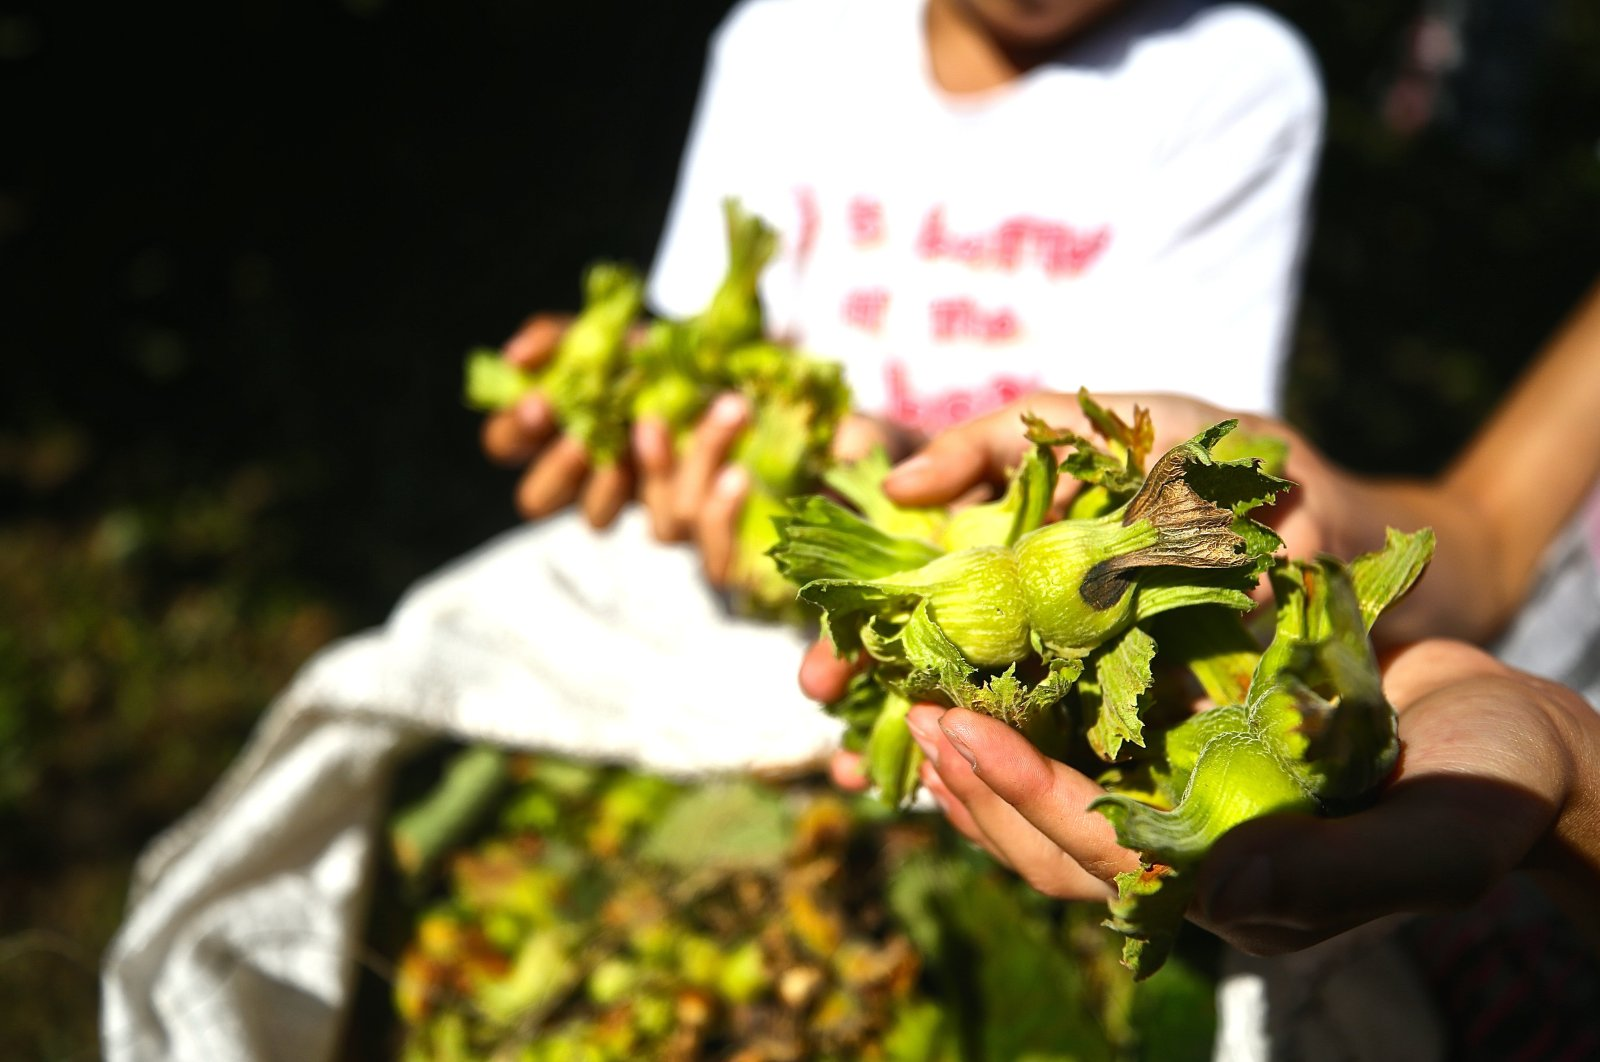 A producer shows fresh hazelnuts in Düzce province, northwestern Turkey, July 8, 2019. (AA Photo)